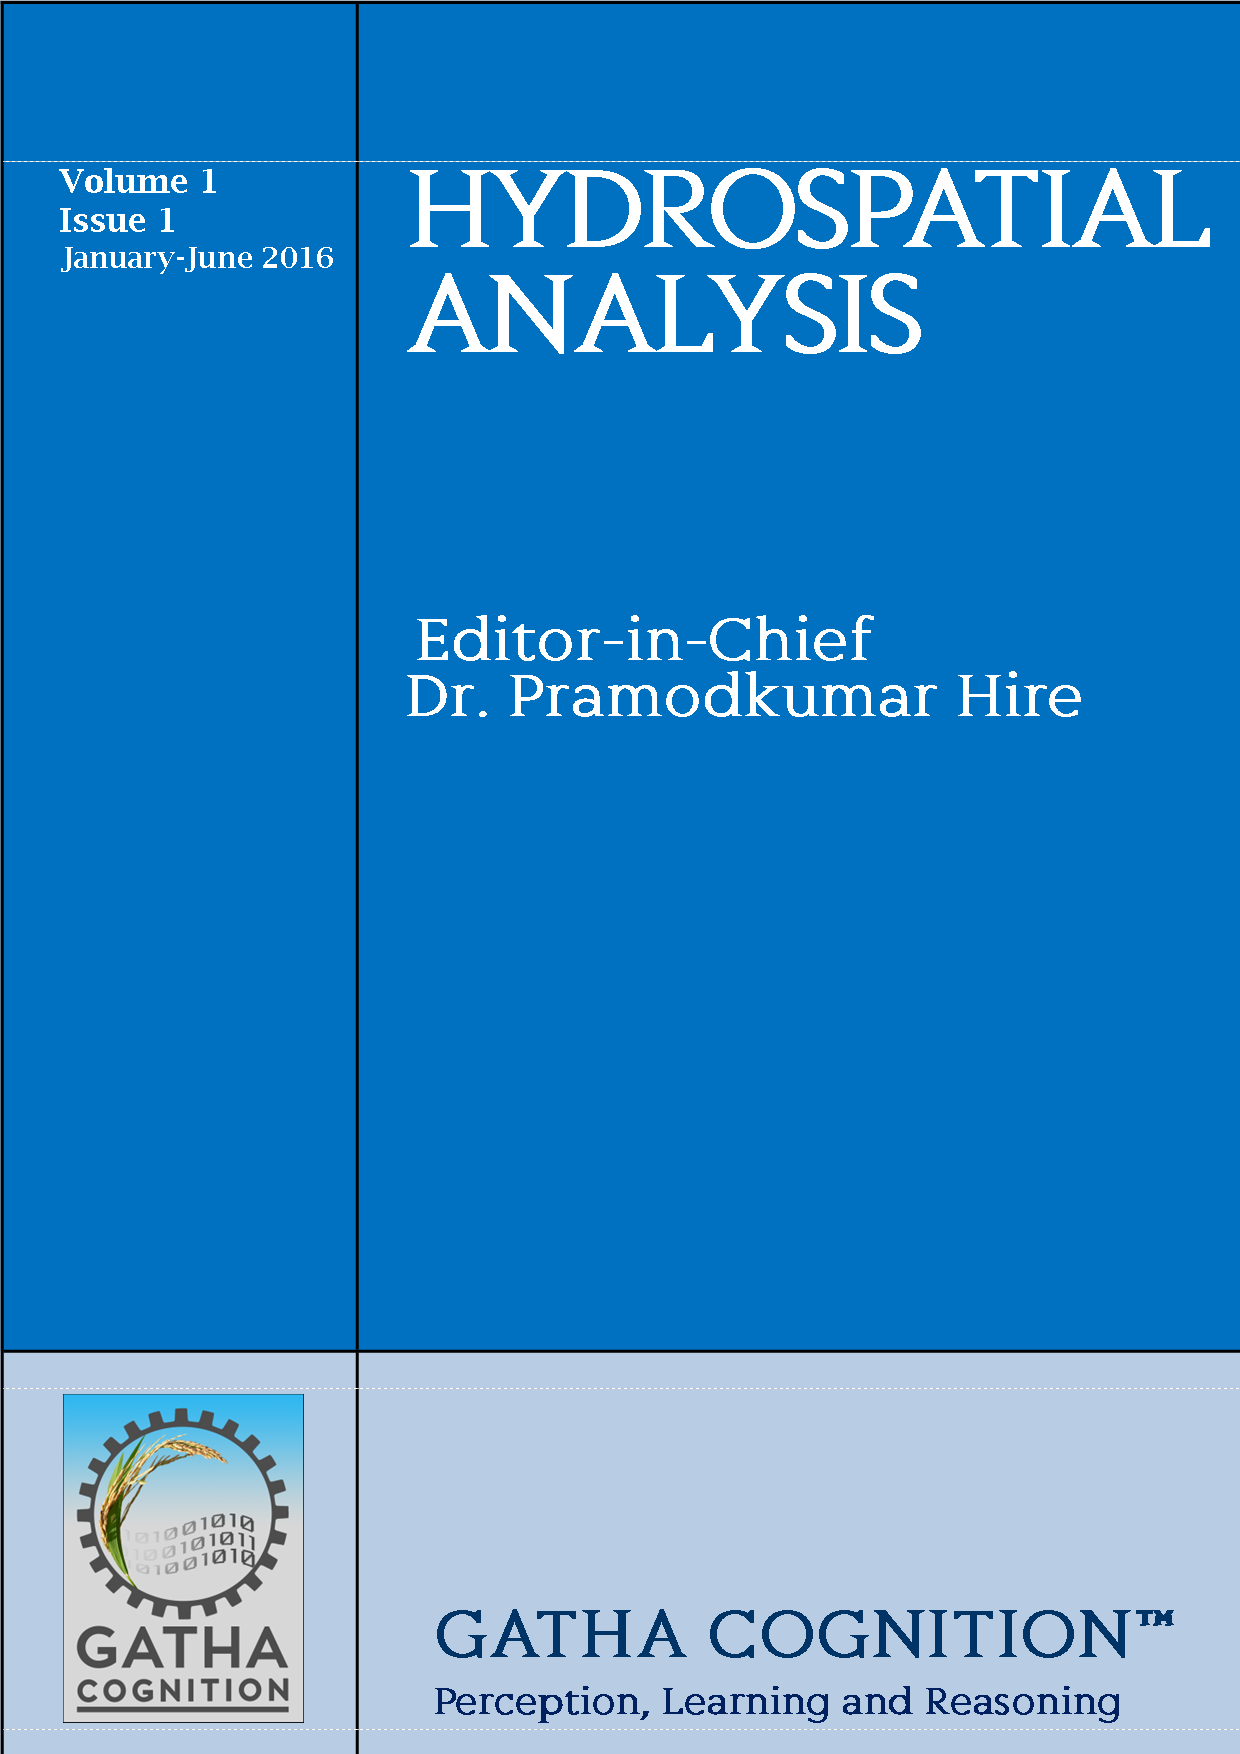 Hydrospatial Analysis